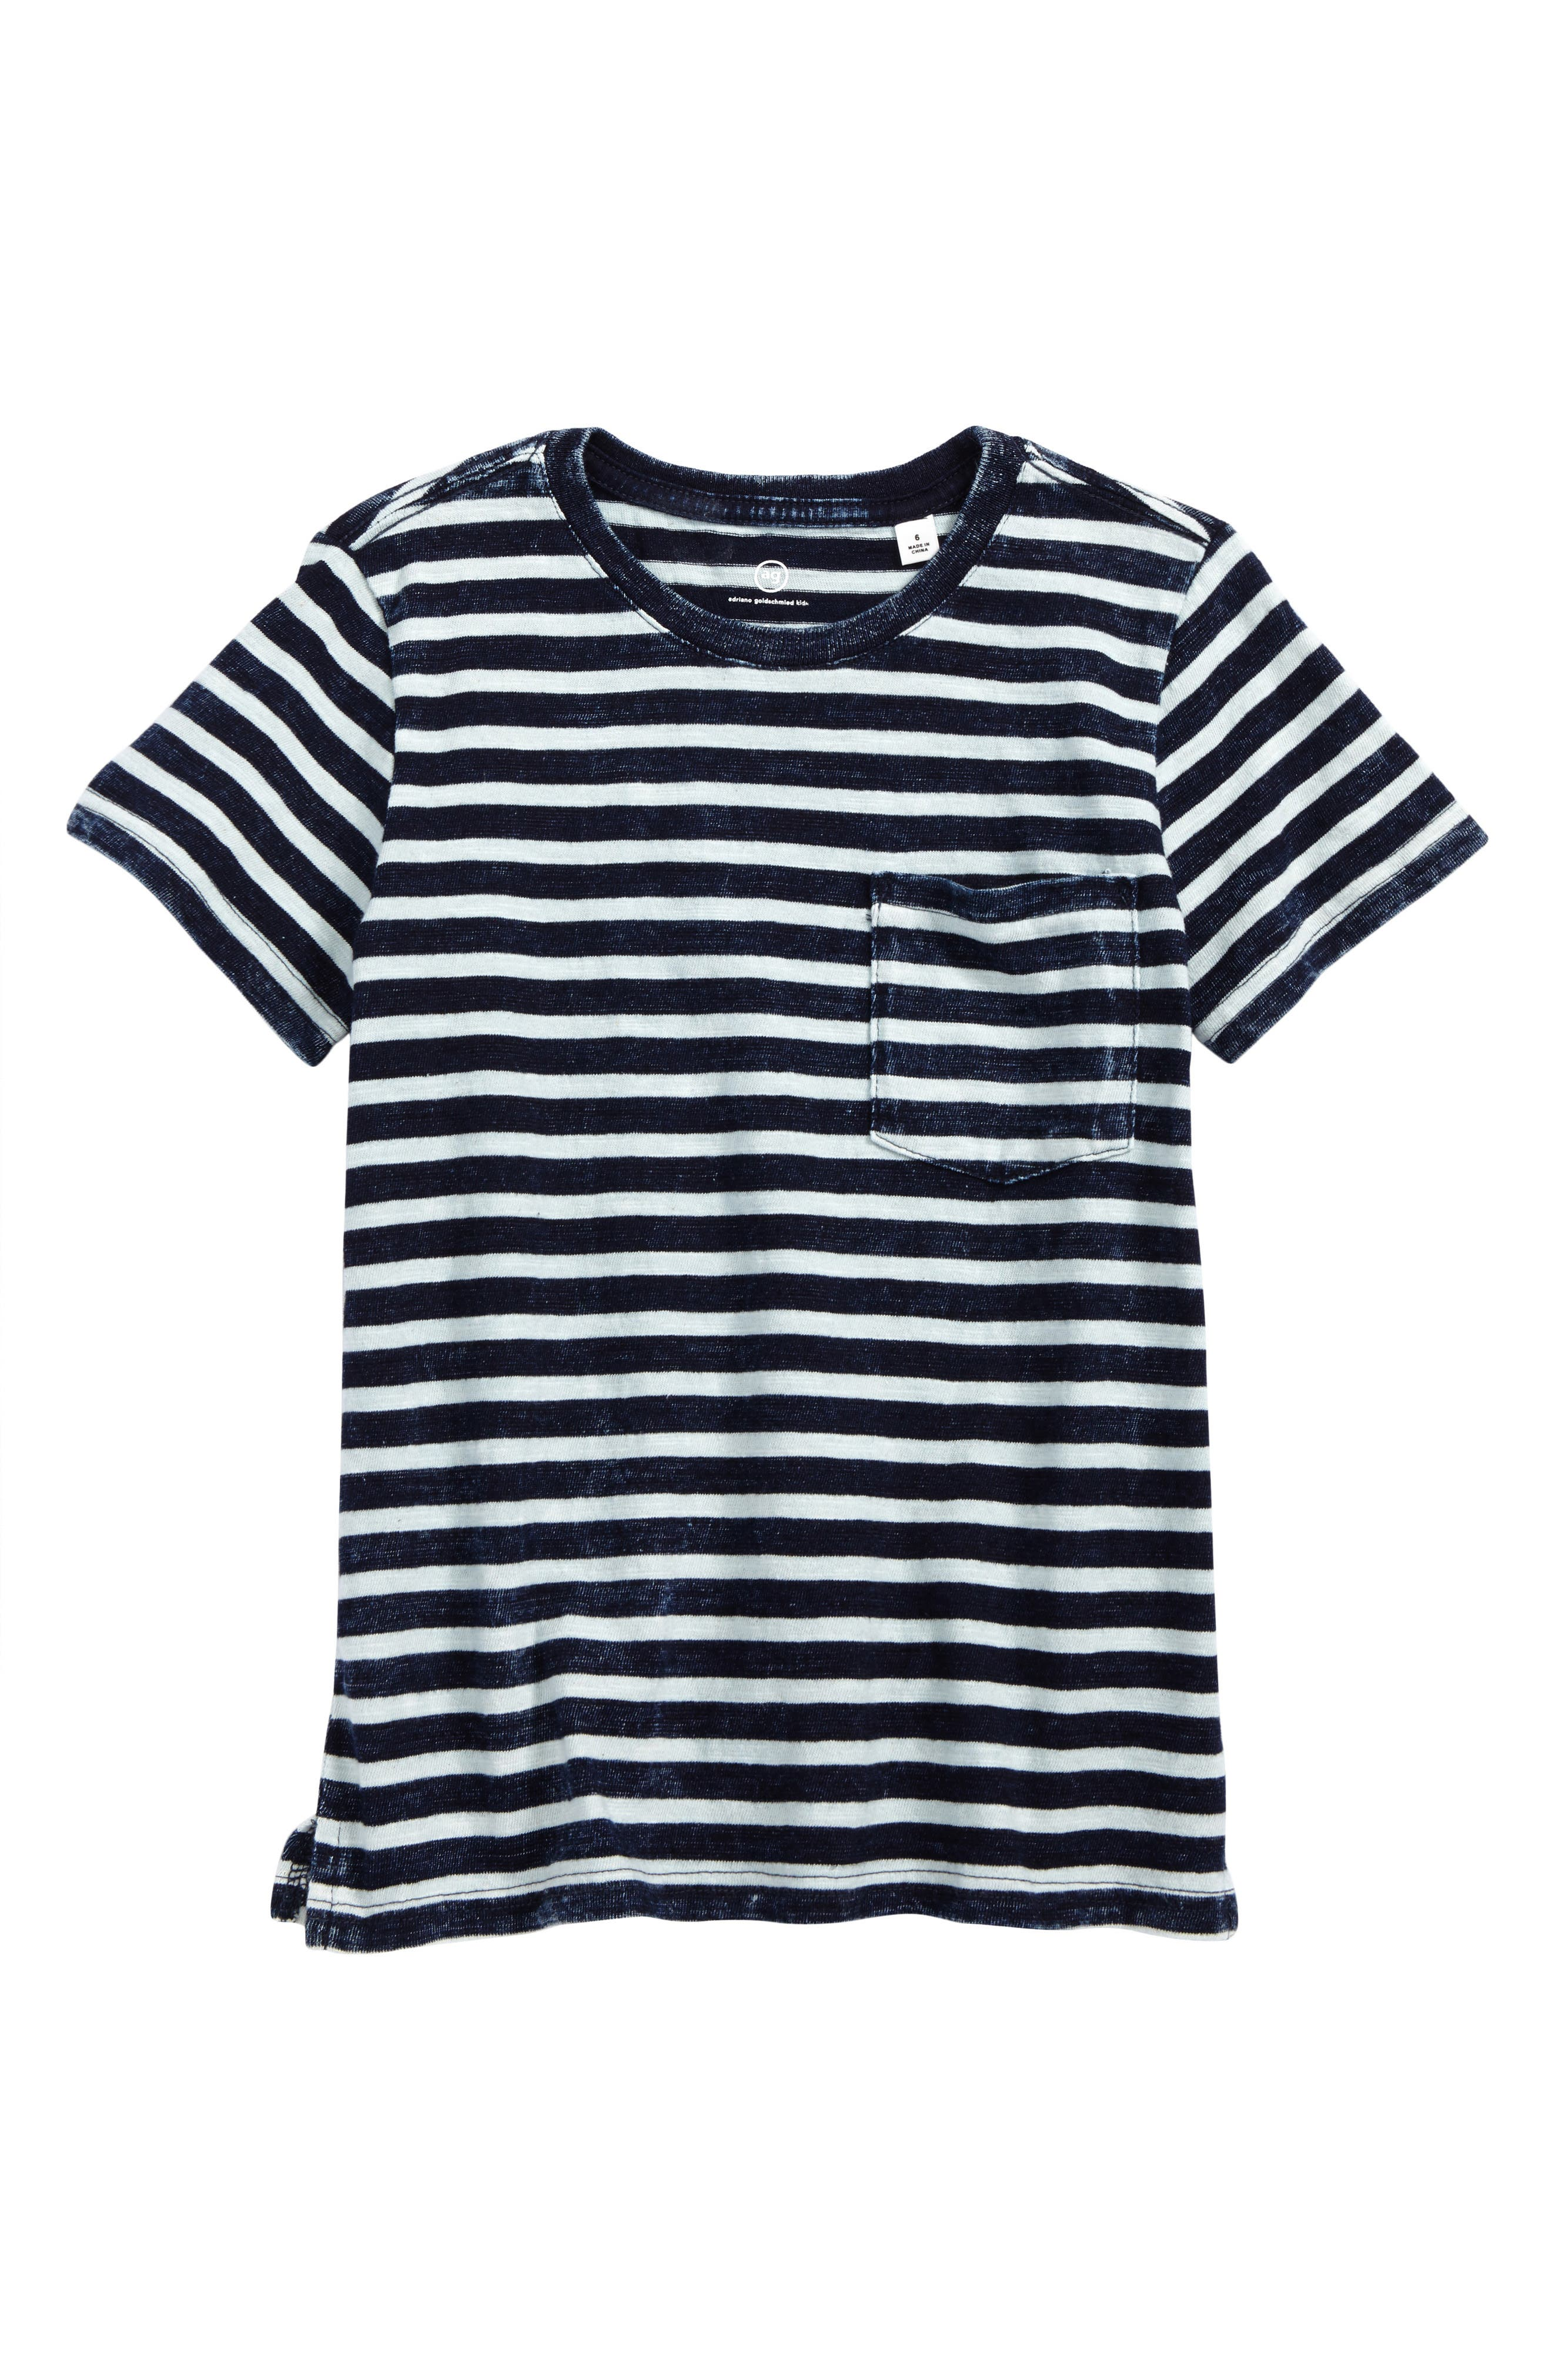 Main Image - AG Acid Wash T-Shirt (Little Boys & Big Boys)